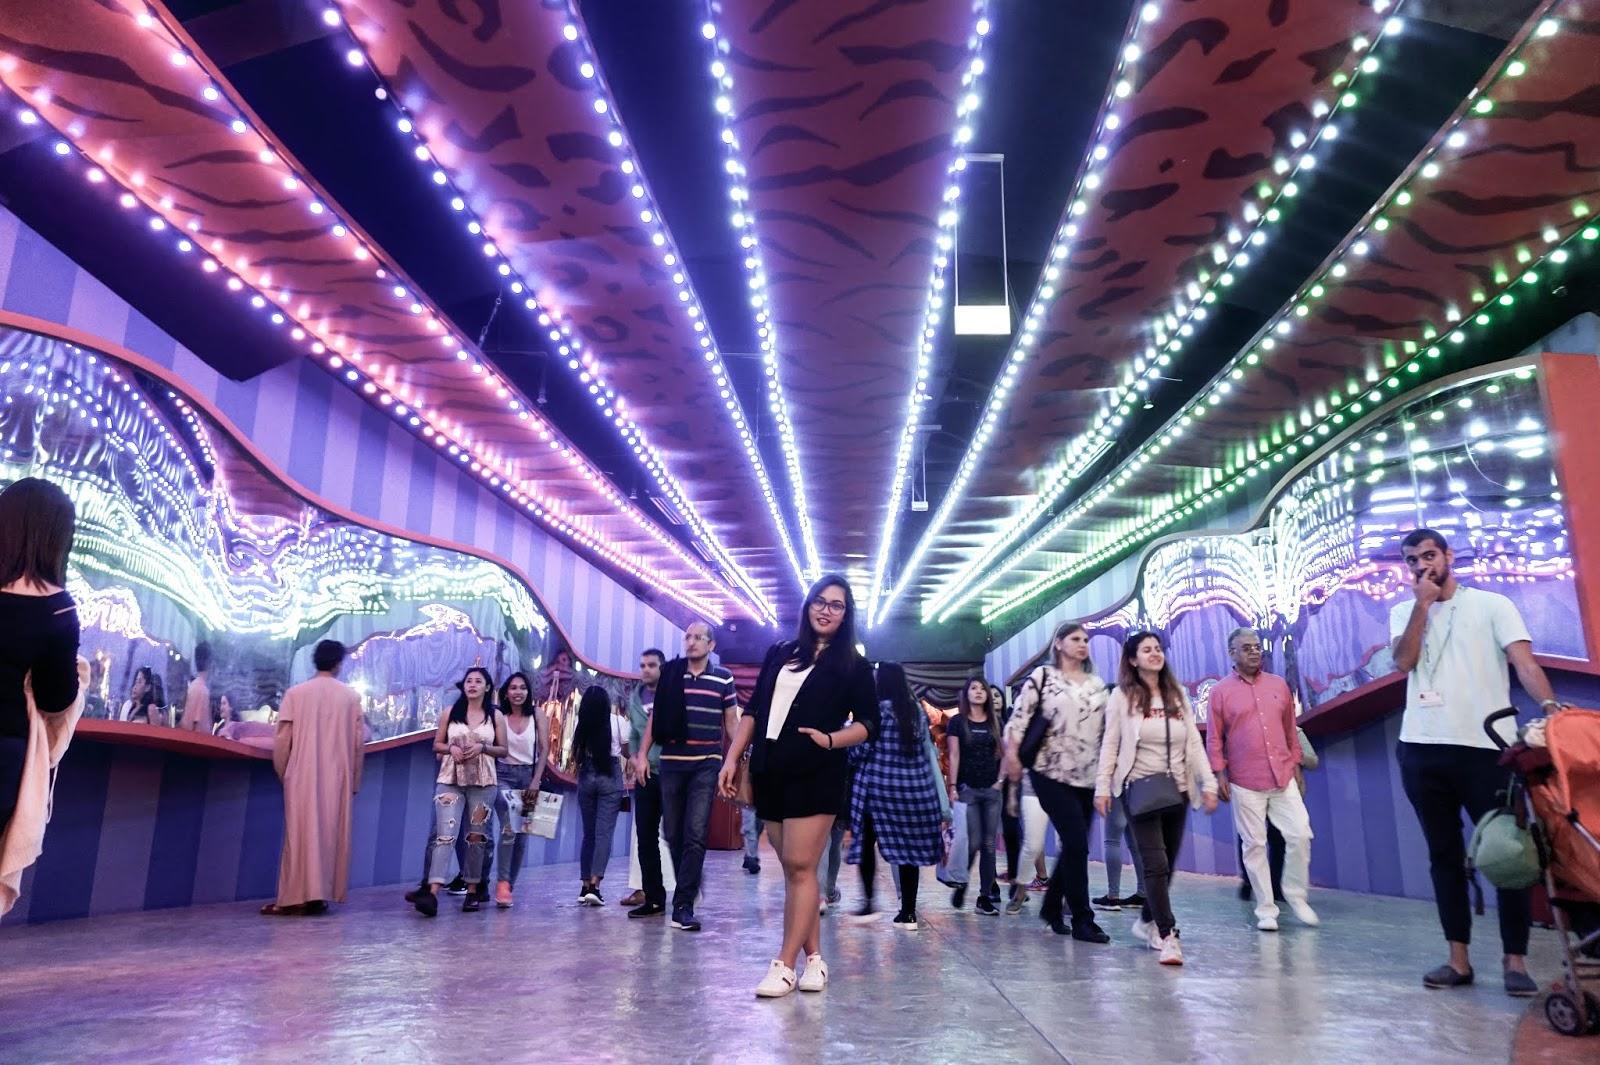 Dreamworks in Motiongate Dubai